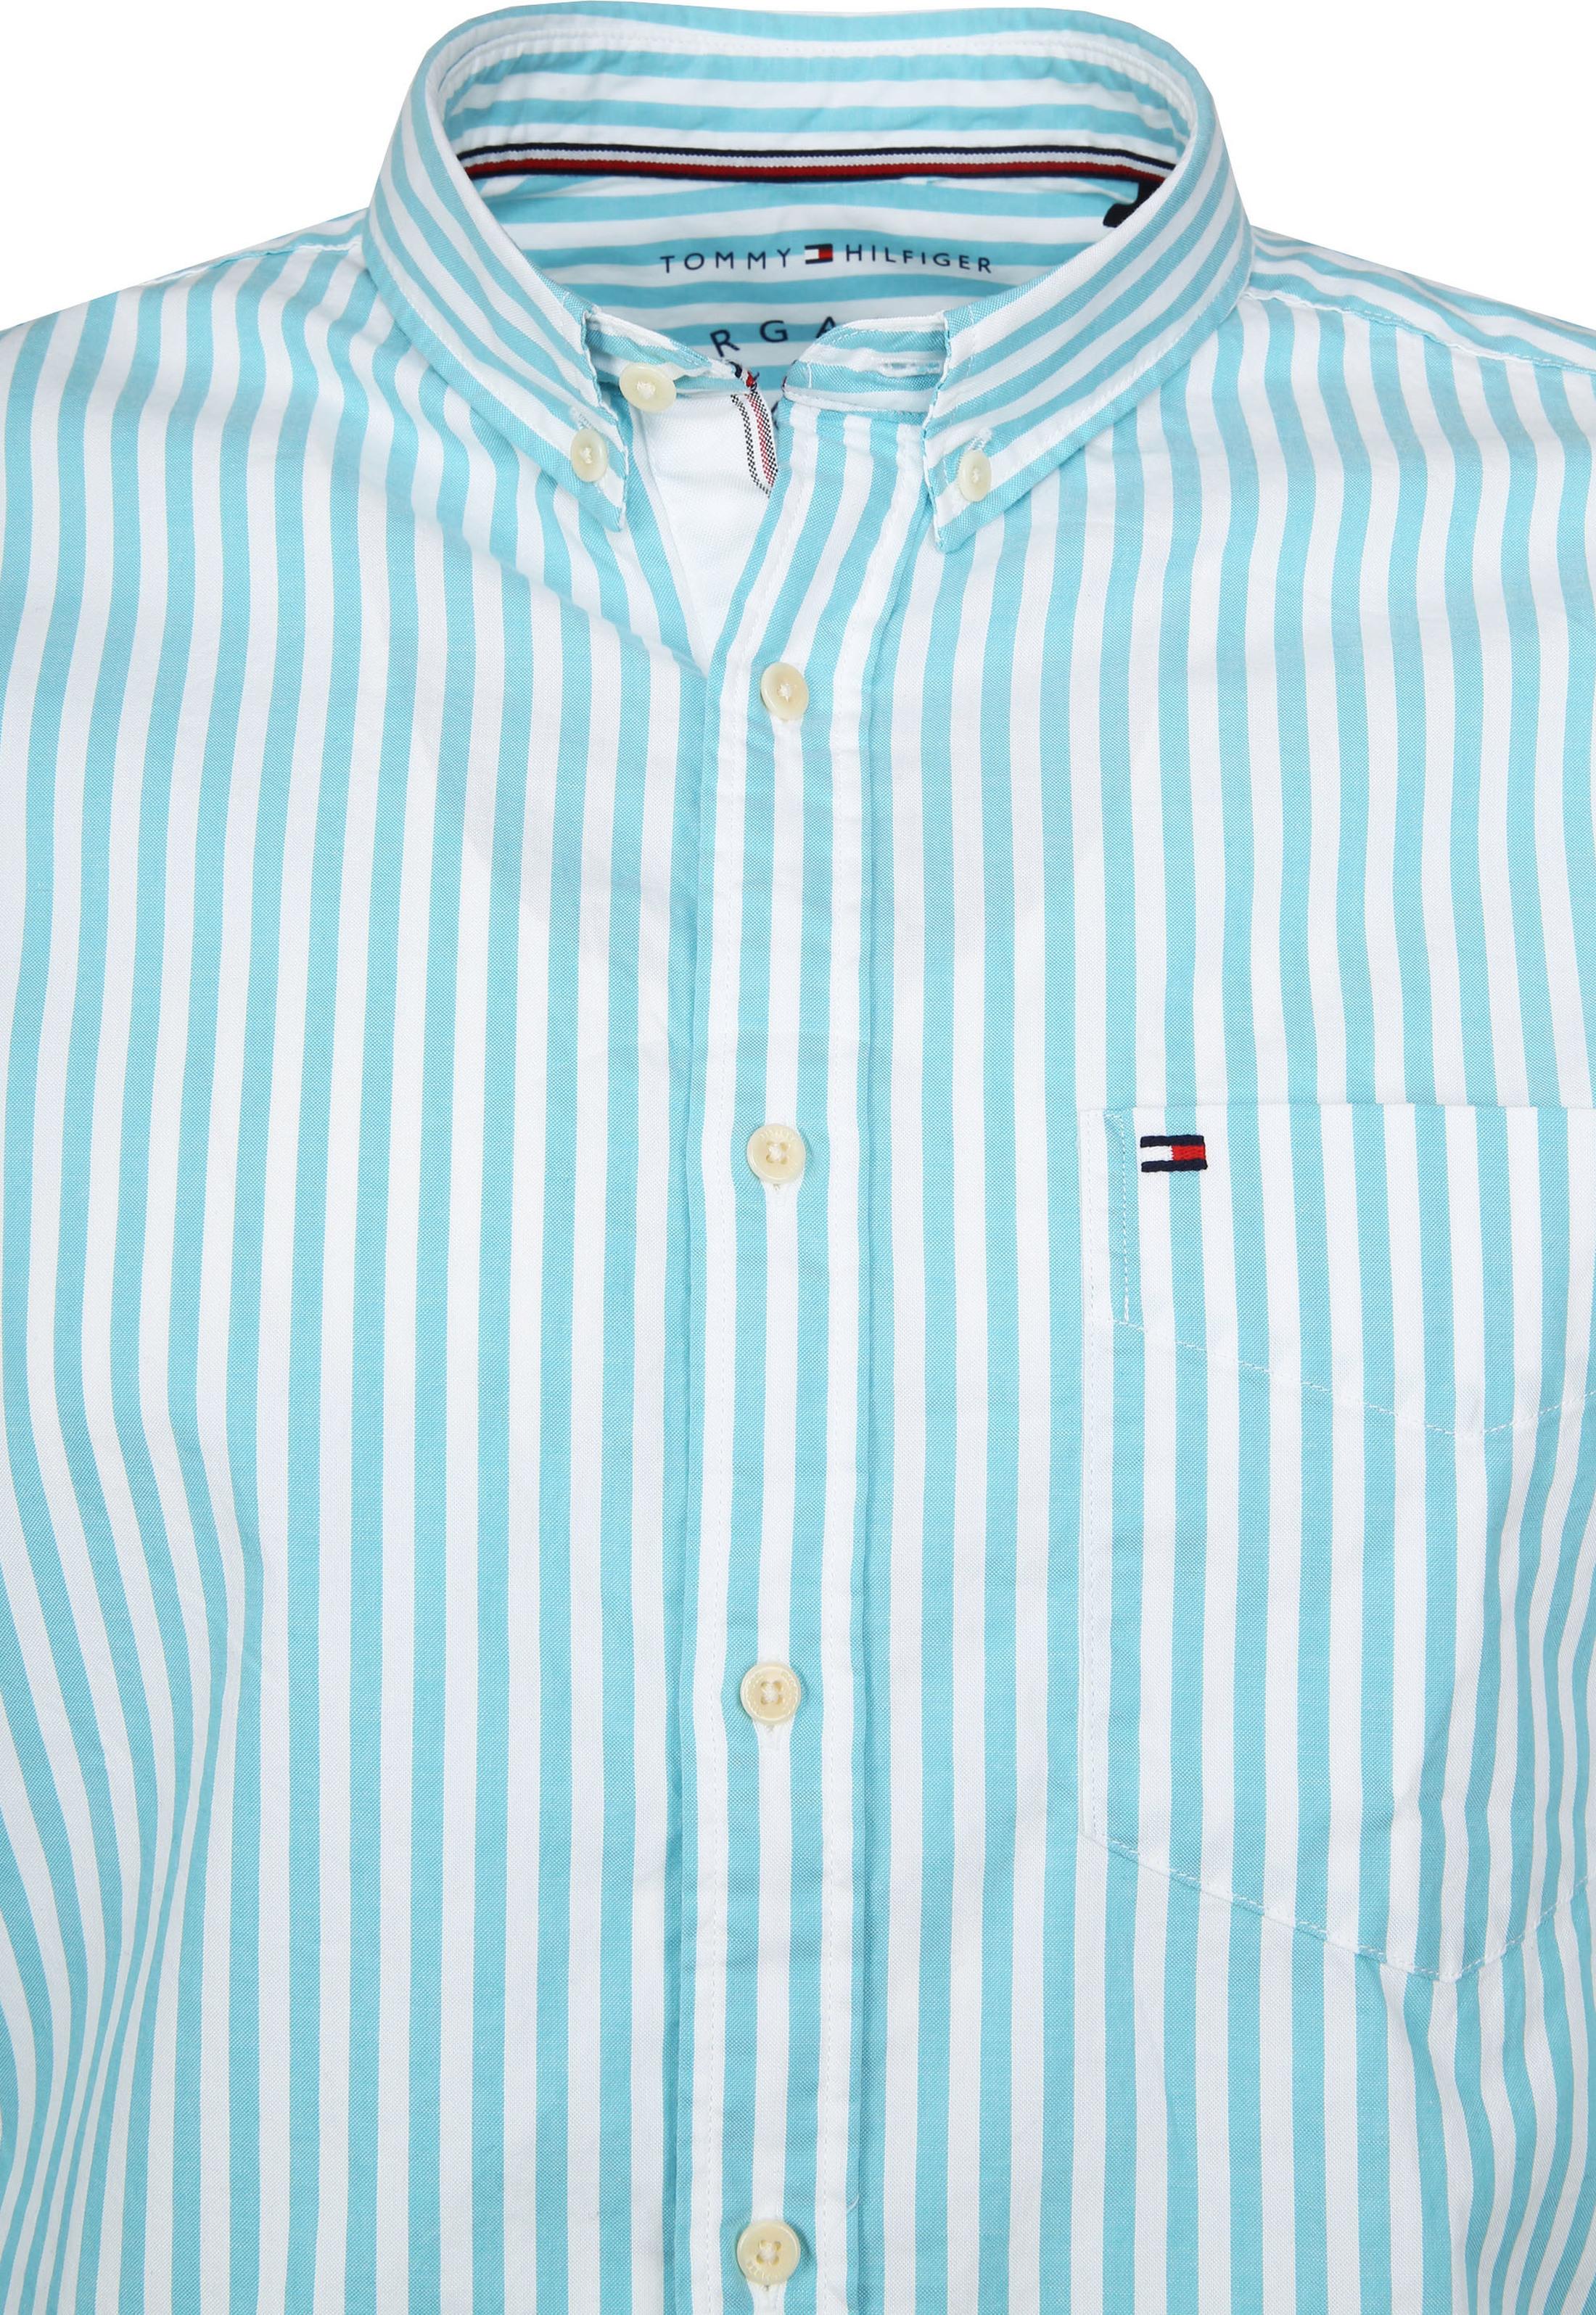 Tommy Hilfiger Oxford Stripes Shirt foto 2